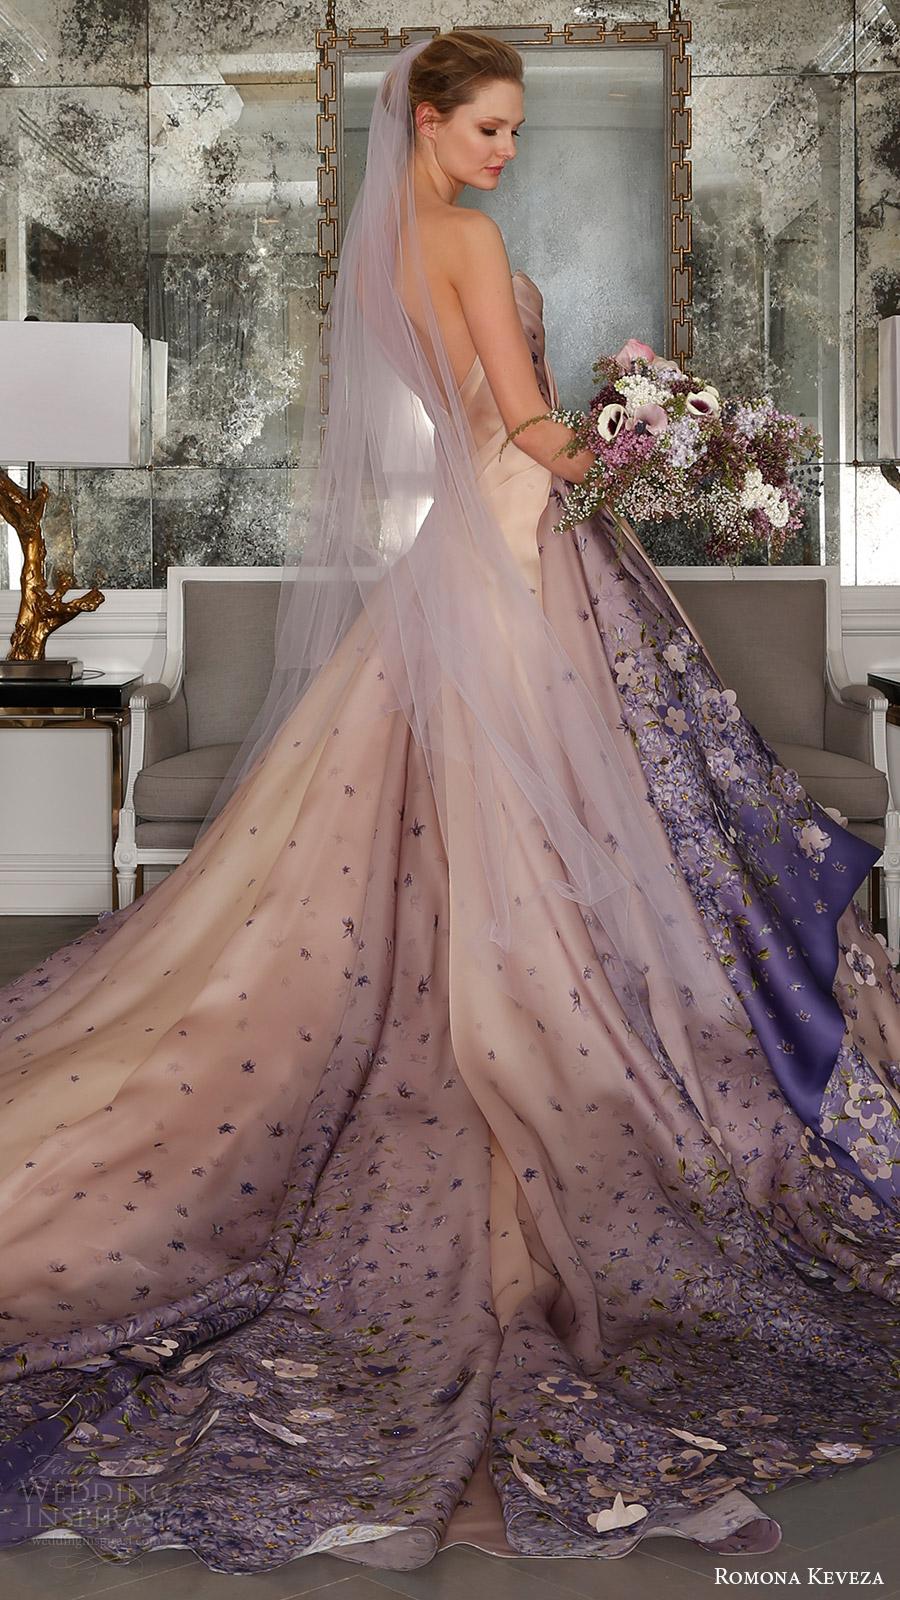 659e491a3 romona keveza bridal spring 2017 one shoulder sweetheart silk organza ball  gown wedding dress (rk7413